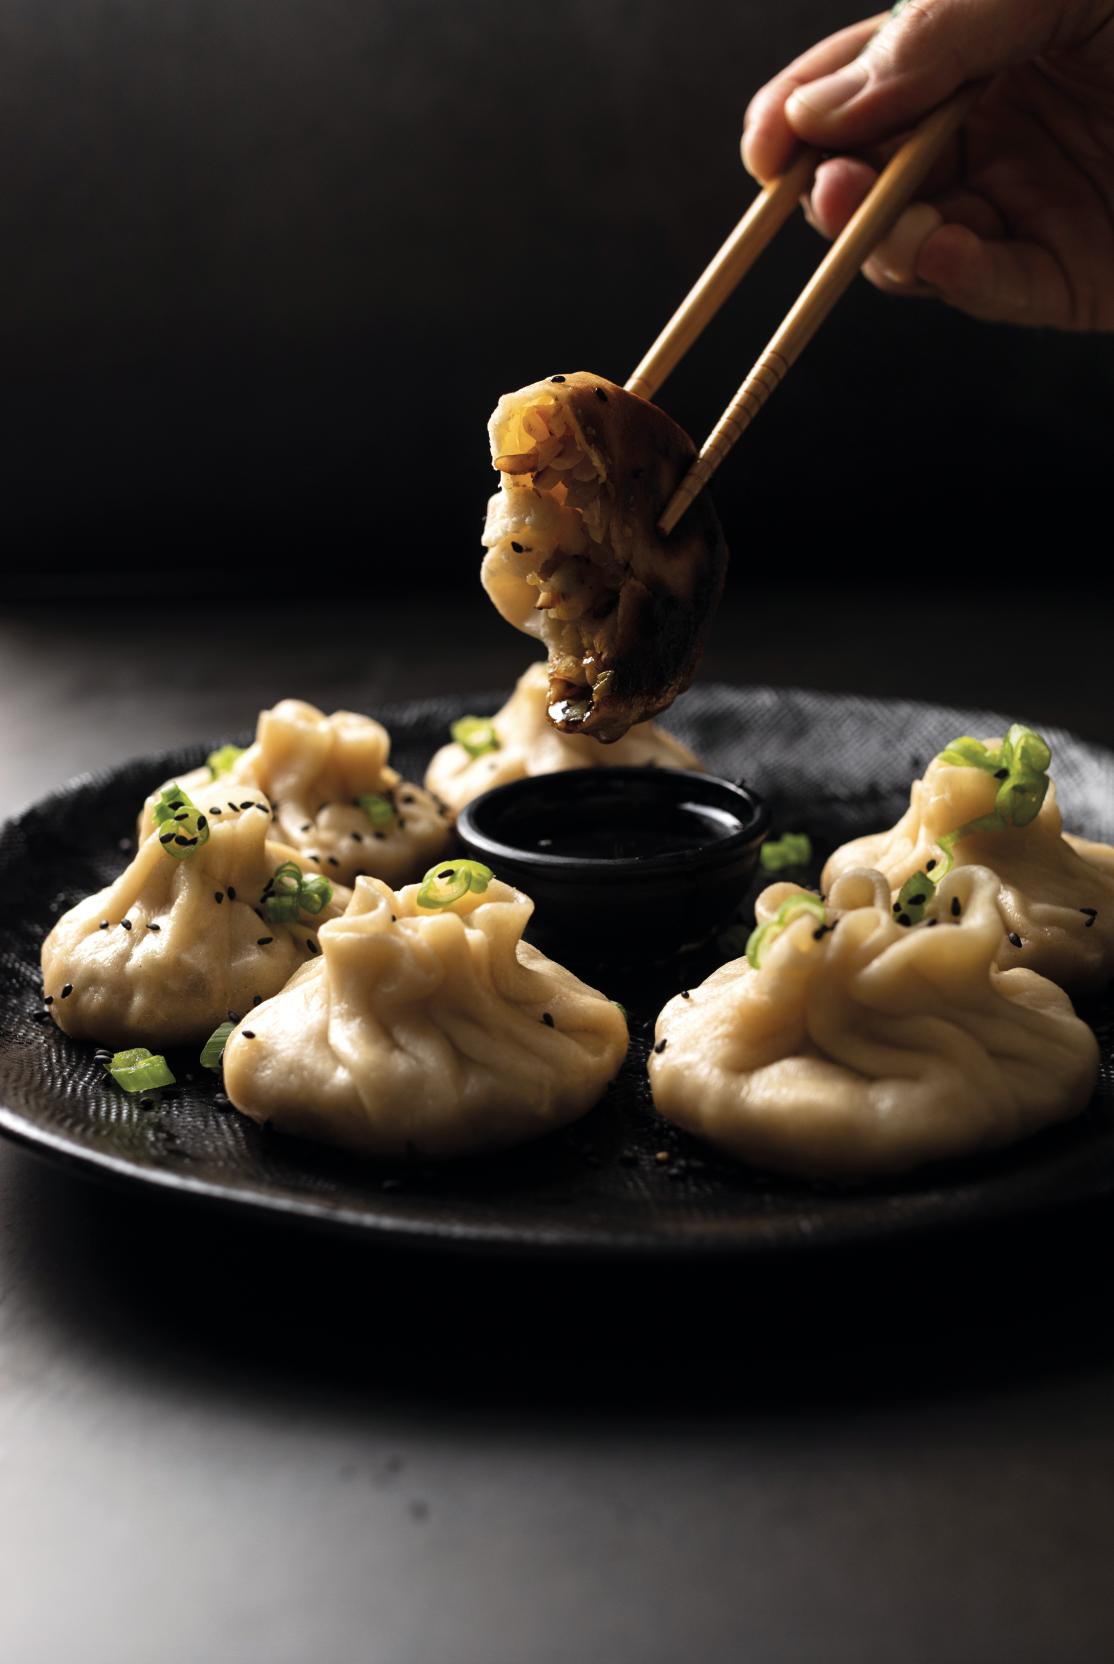 Image of Günstiges Dumplings-Rezept (vegan)